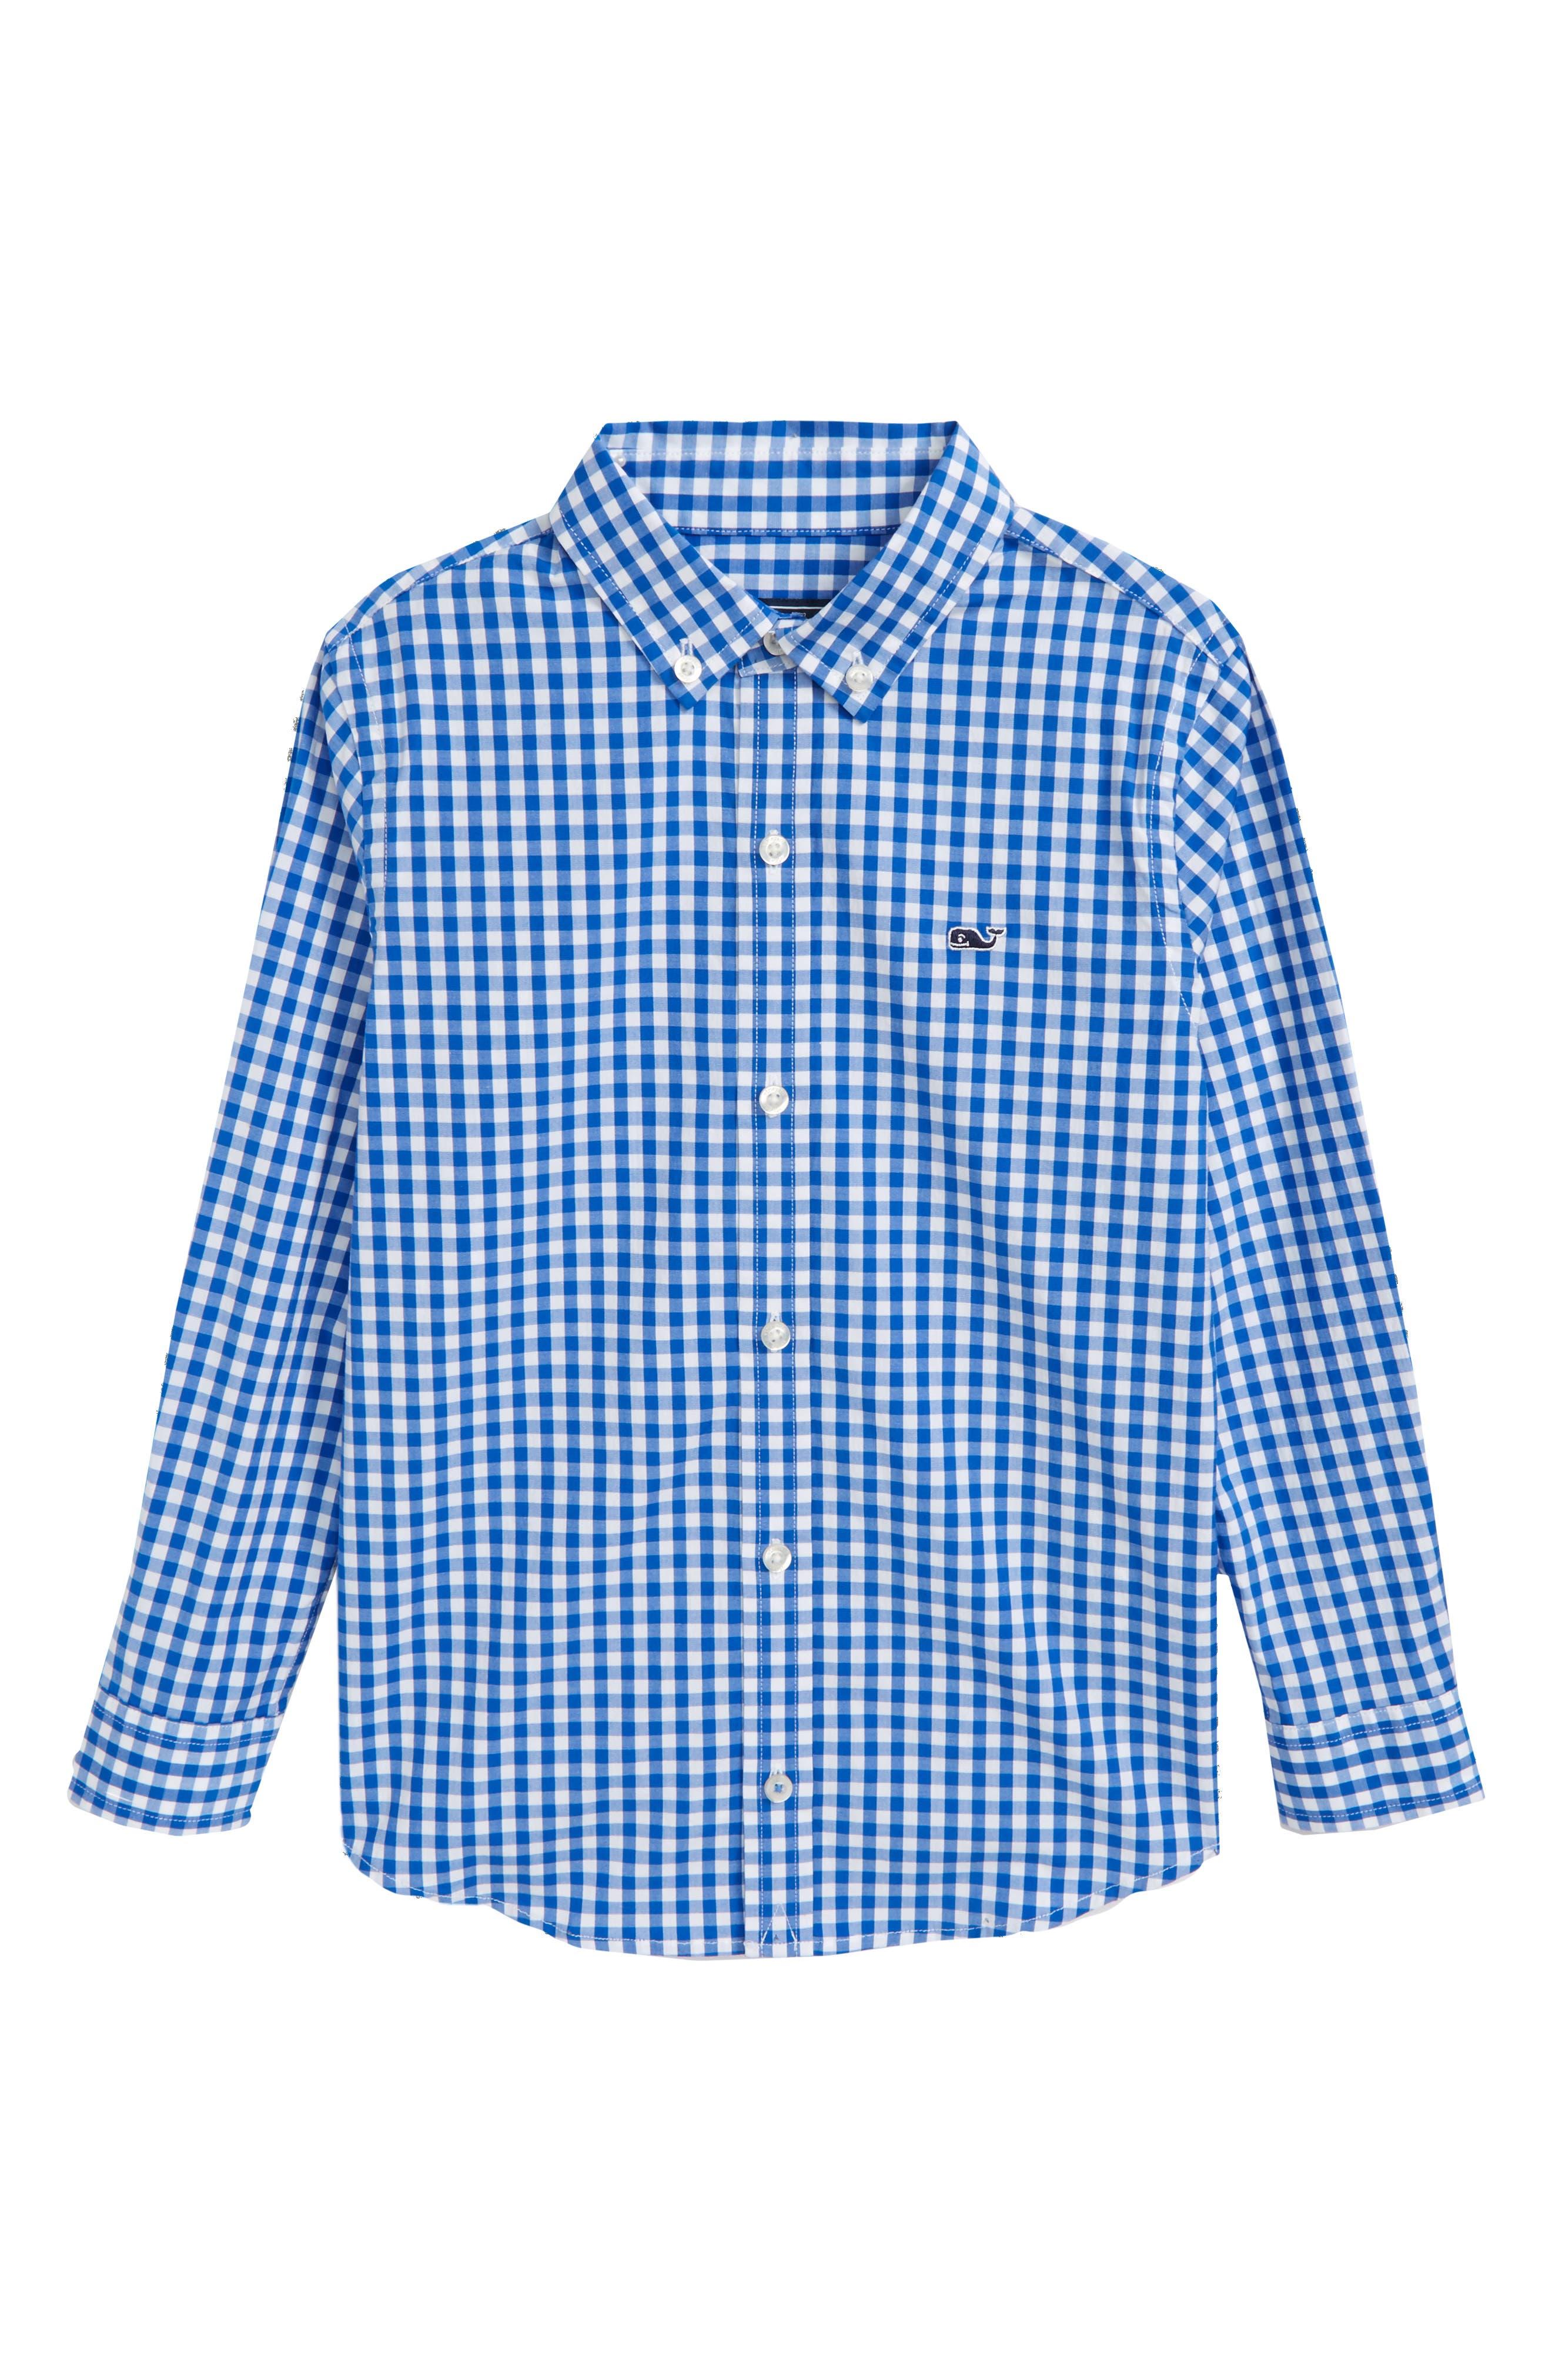 Carleton Gingham Shirt,                             Main thumbnail 1, color,                             Spinnaker